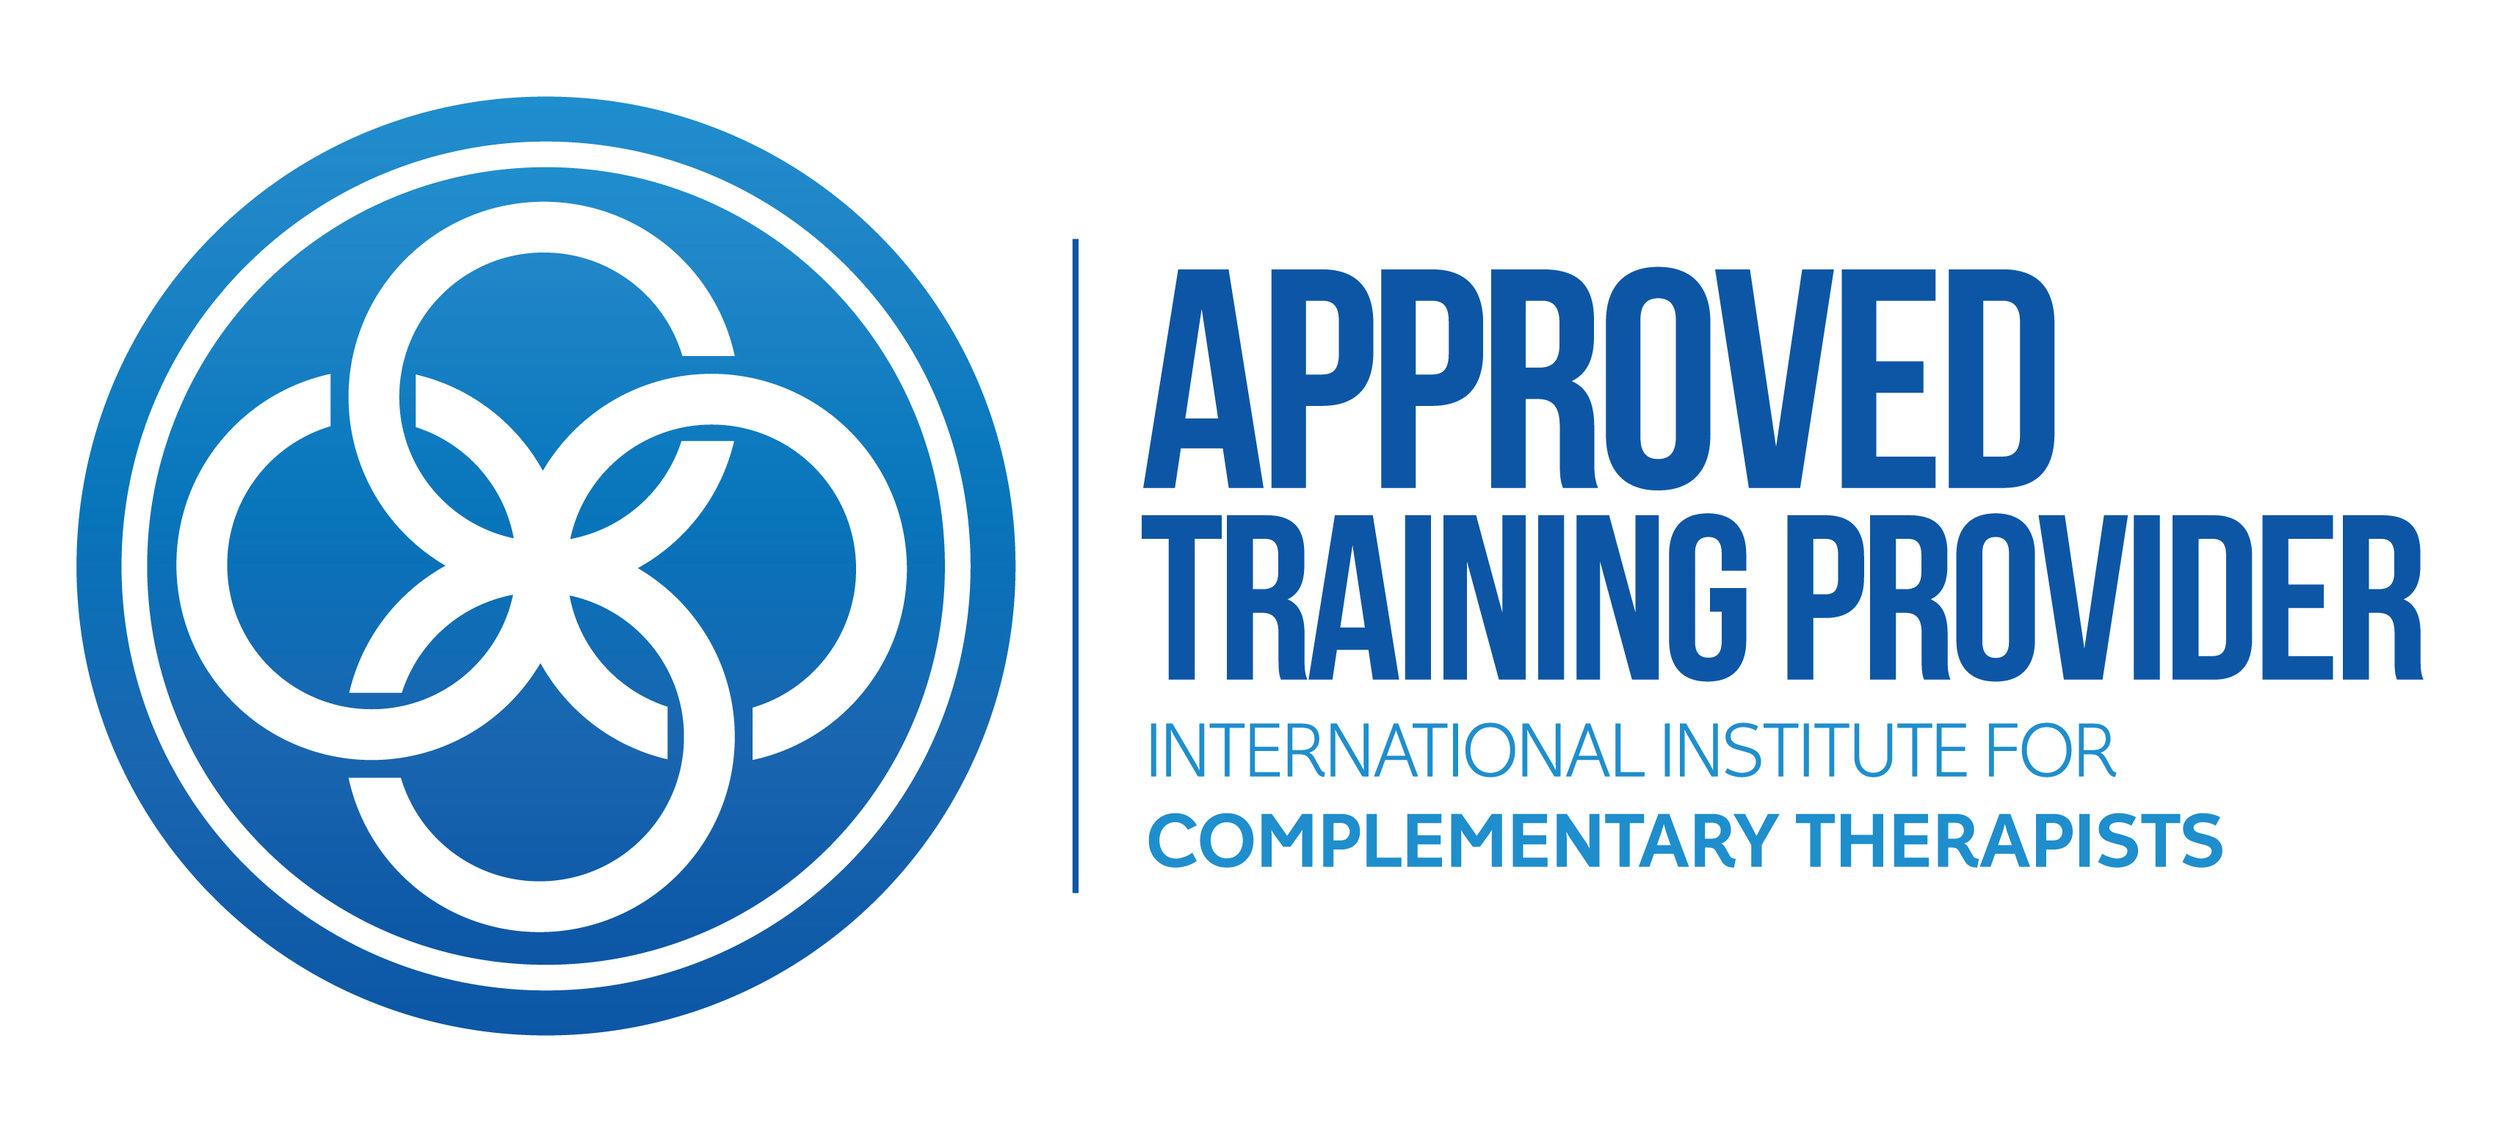 IICT ATP Logo copy.jpg